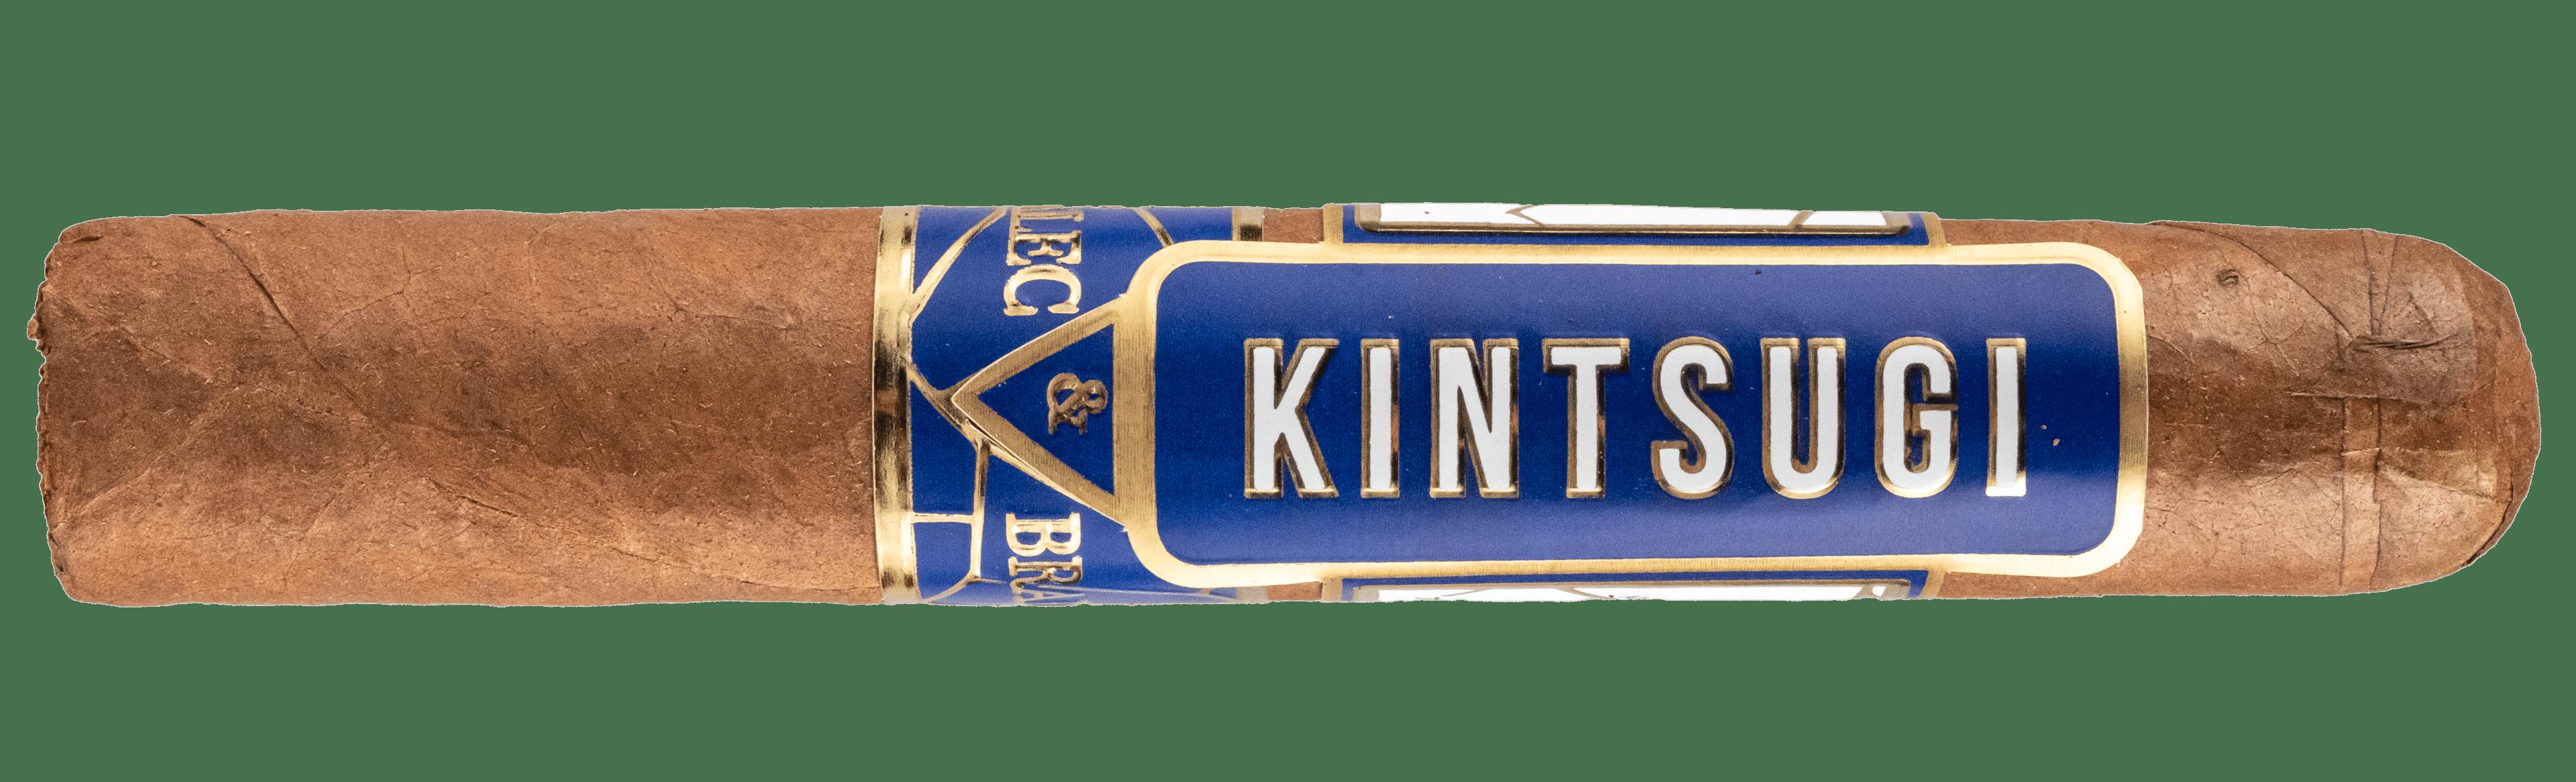 Alec & Bradley Kintsugi Robusto - Blind Cigar Review